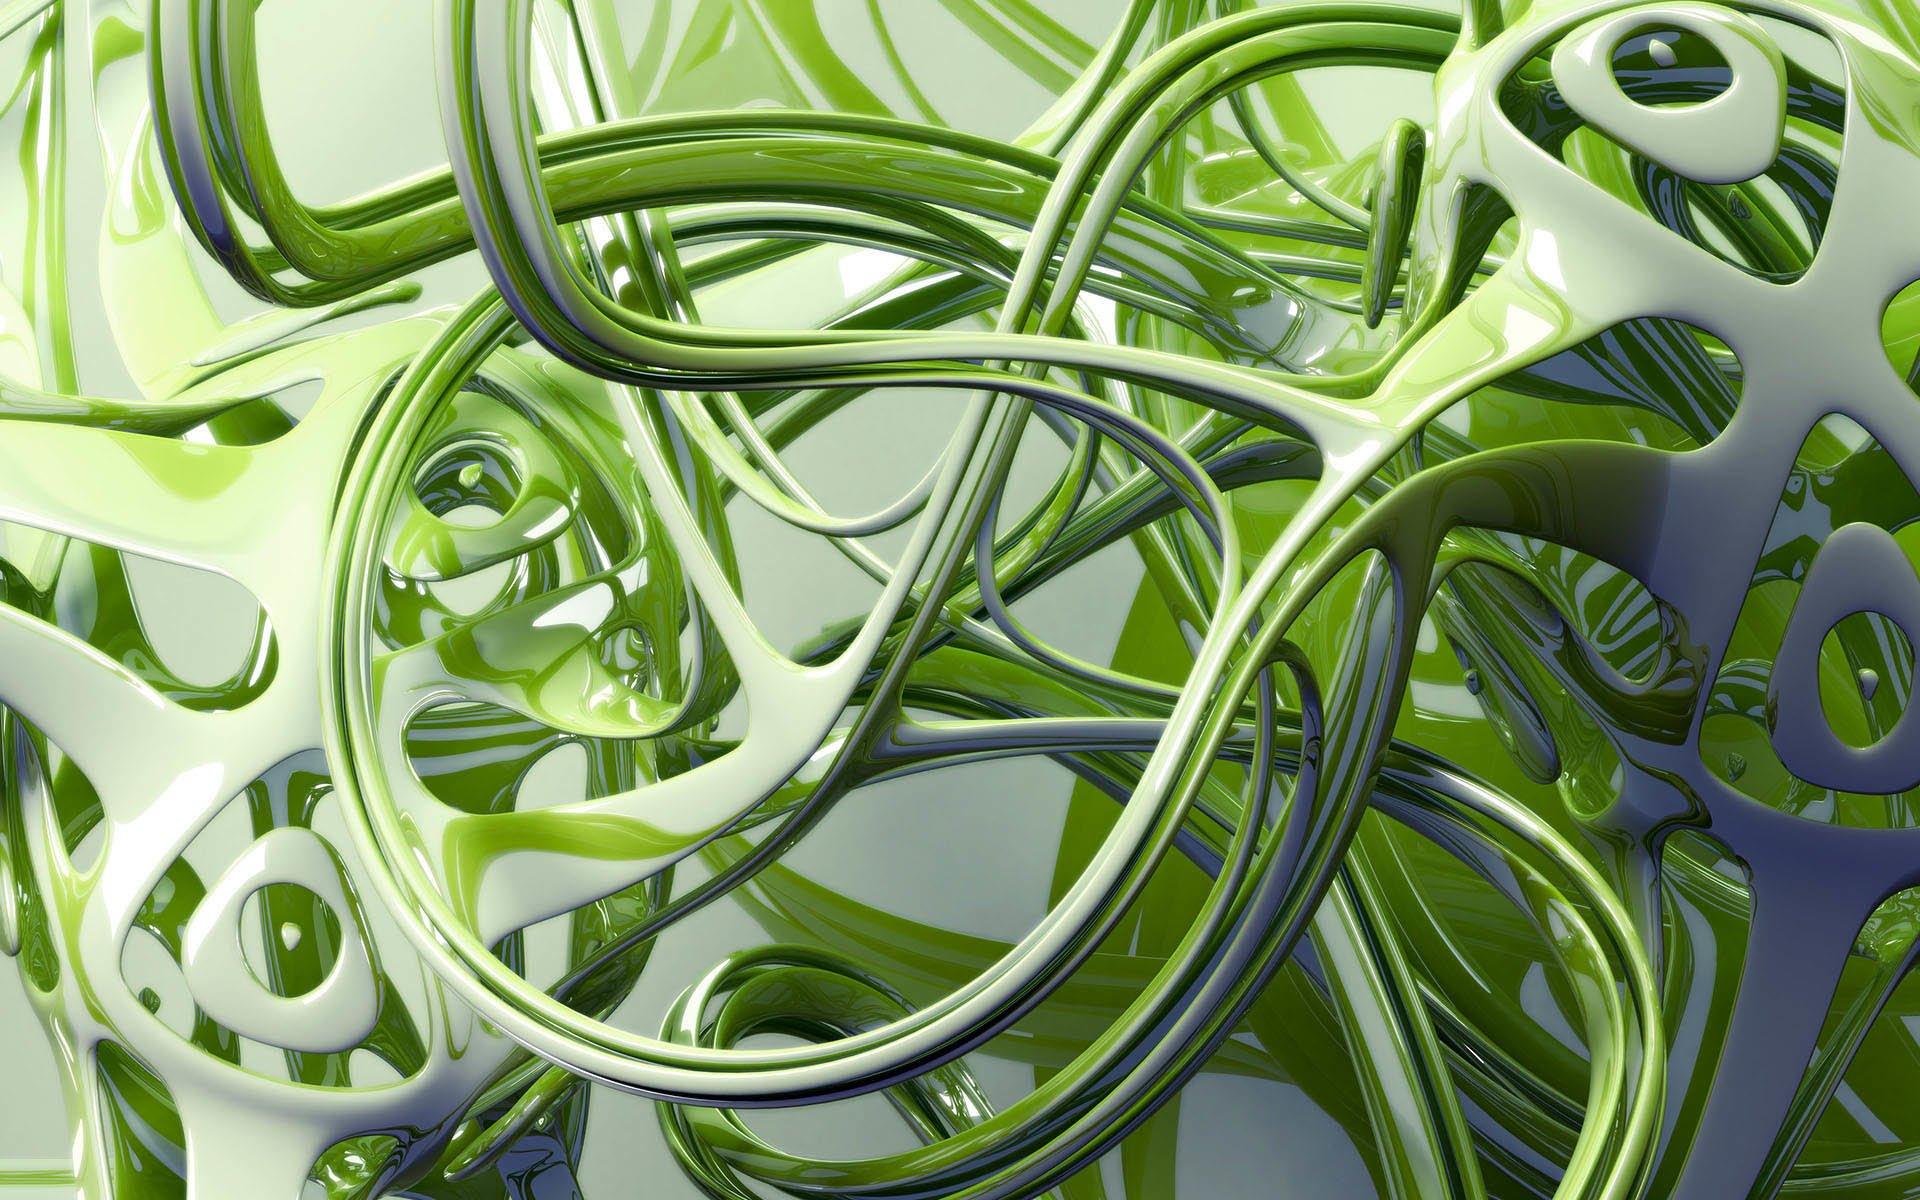 CGI - Abstract  3D Digital CGI Wallpaper